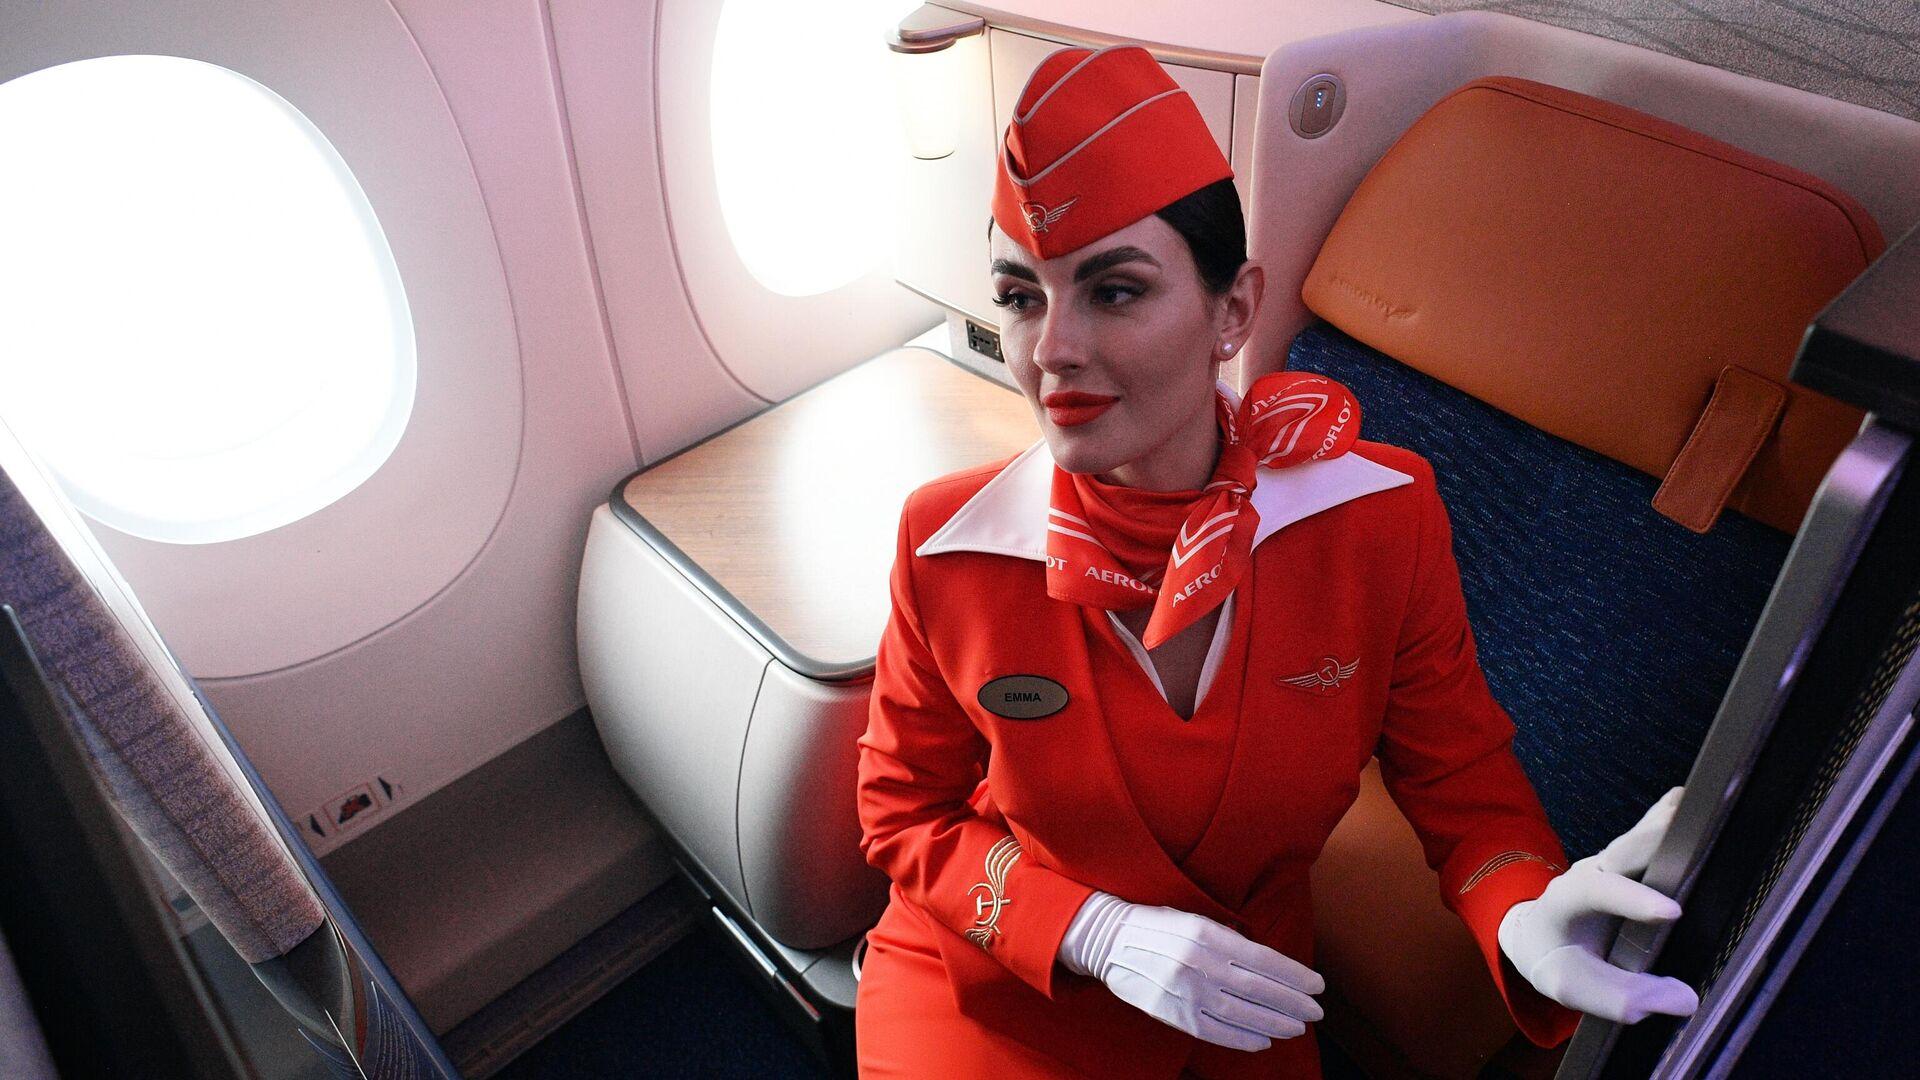 Стюардесса в бизнес-классе самолета Airbus A350-900  - РИА Новости, 1920, 27.09.2020